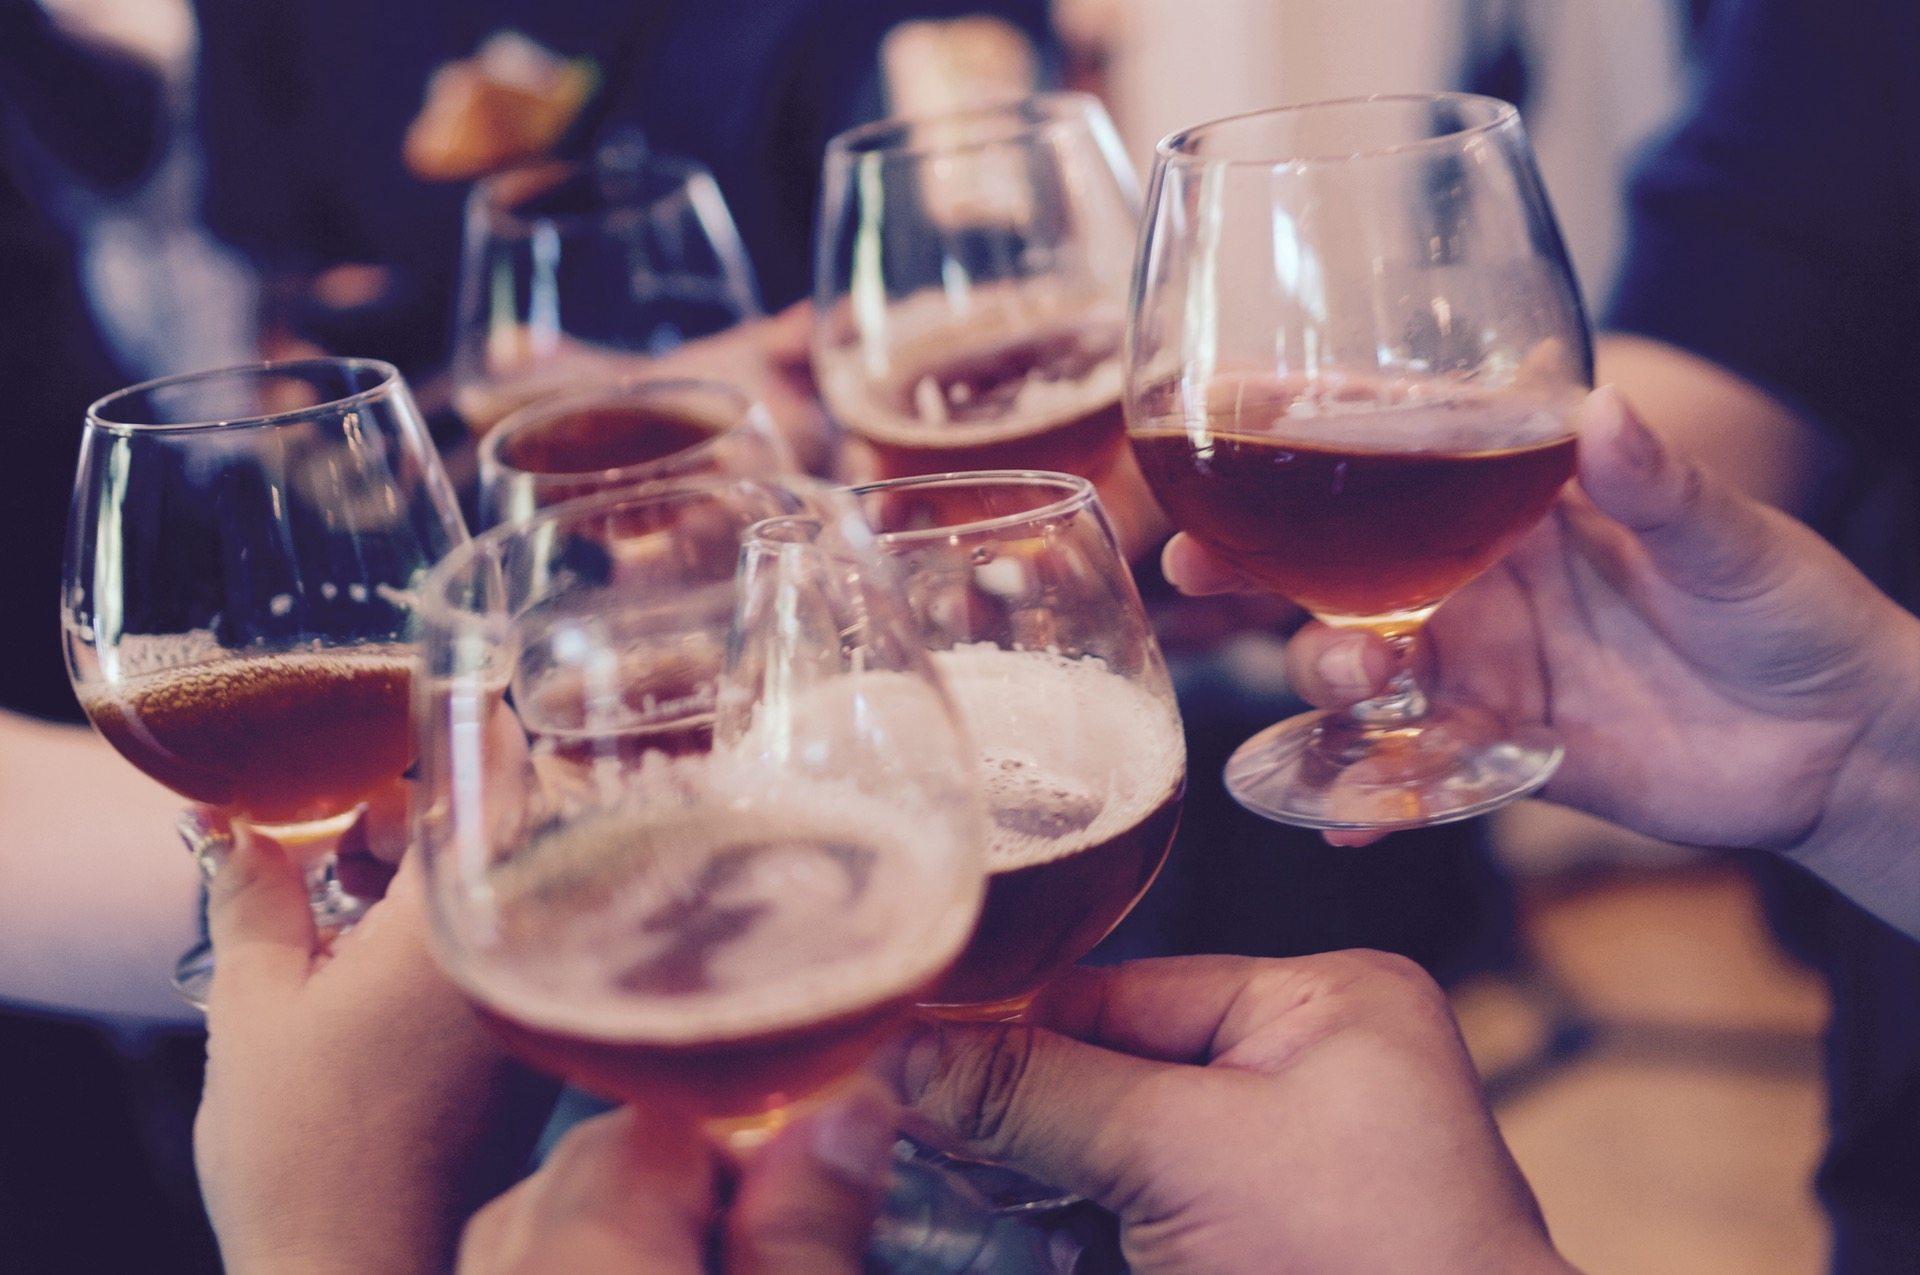 Lithuania's Alcohol Regulation Won't Combat Alcoholism